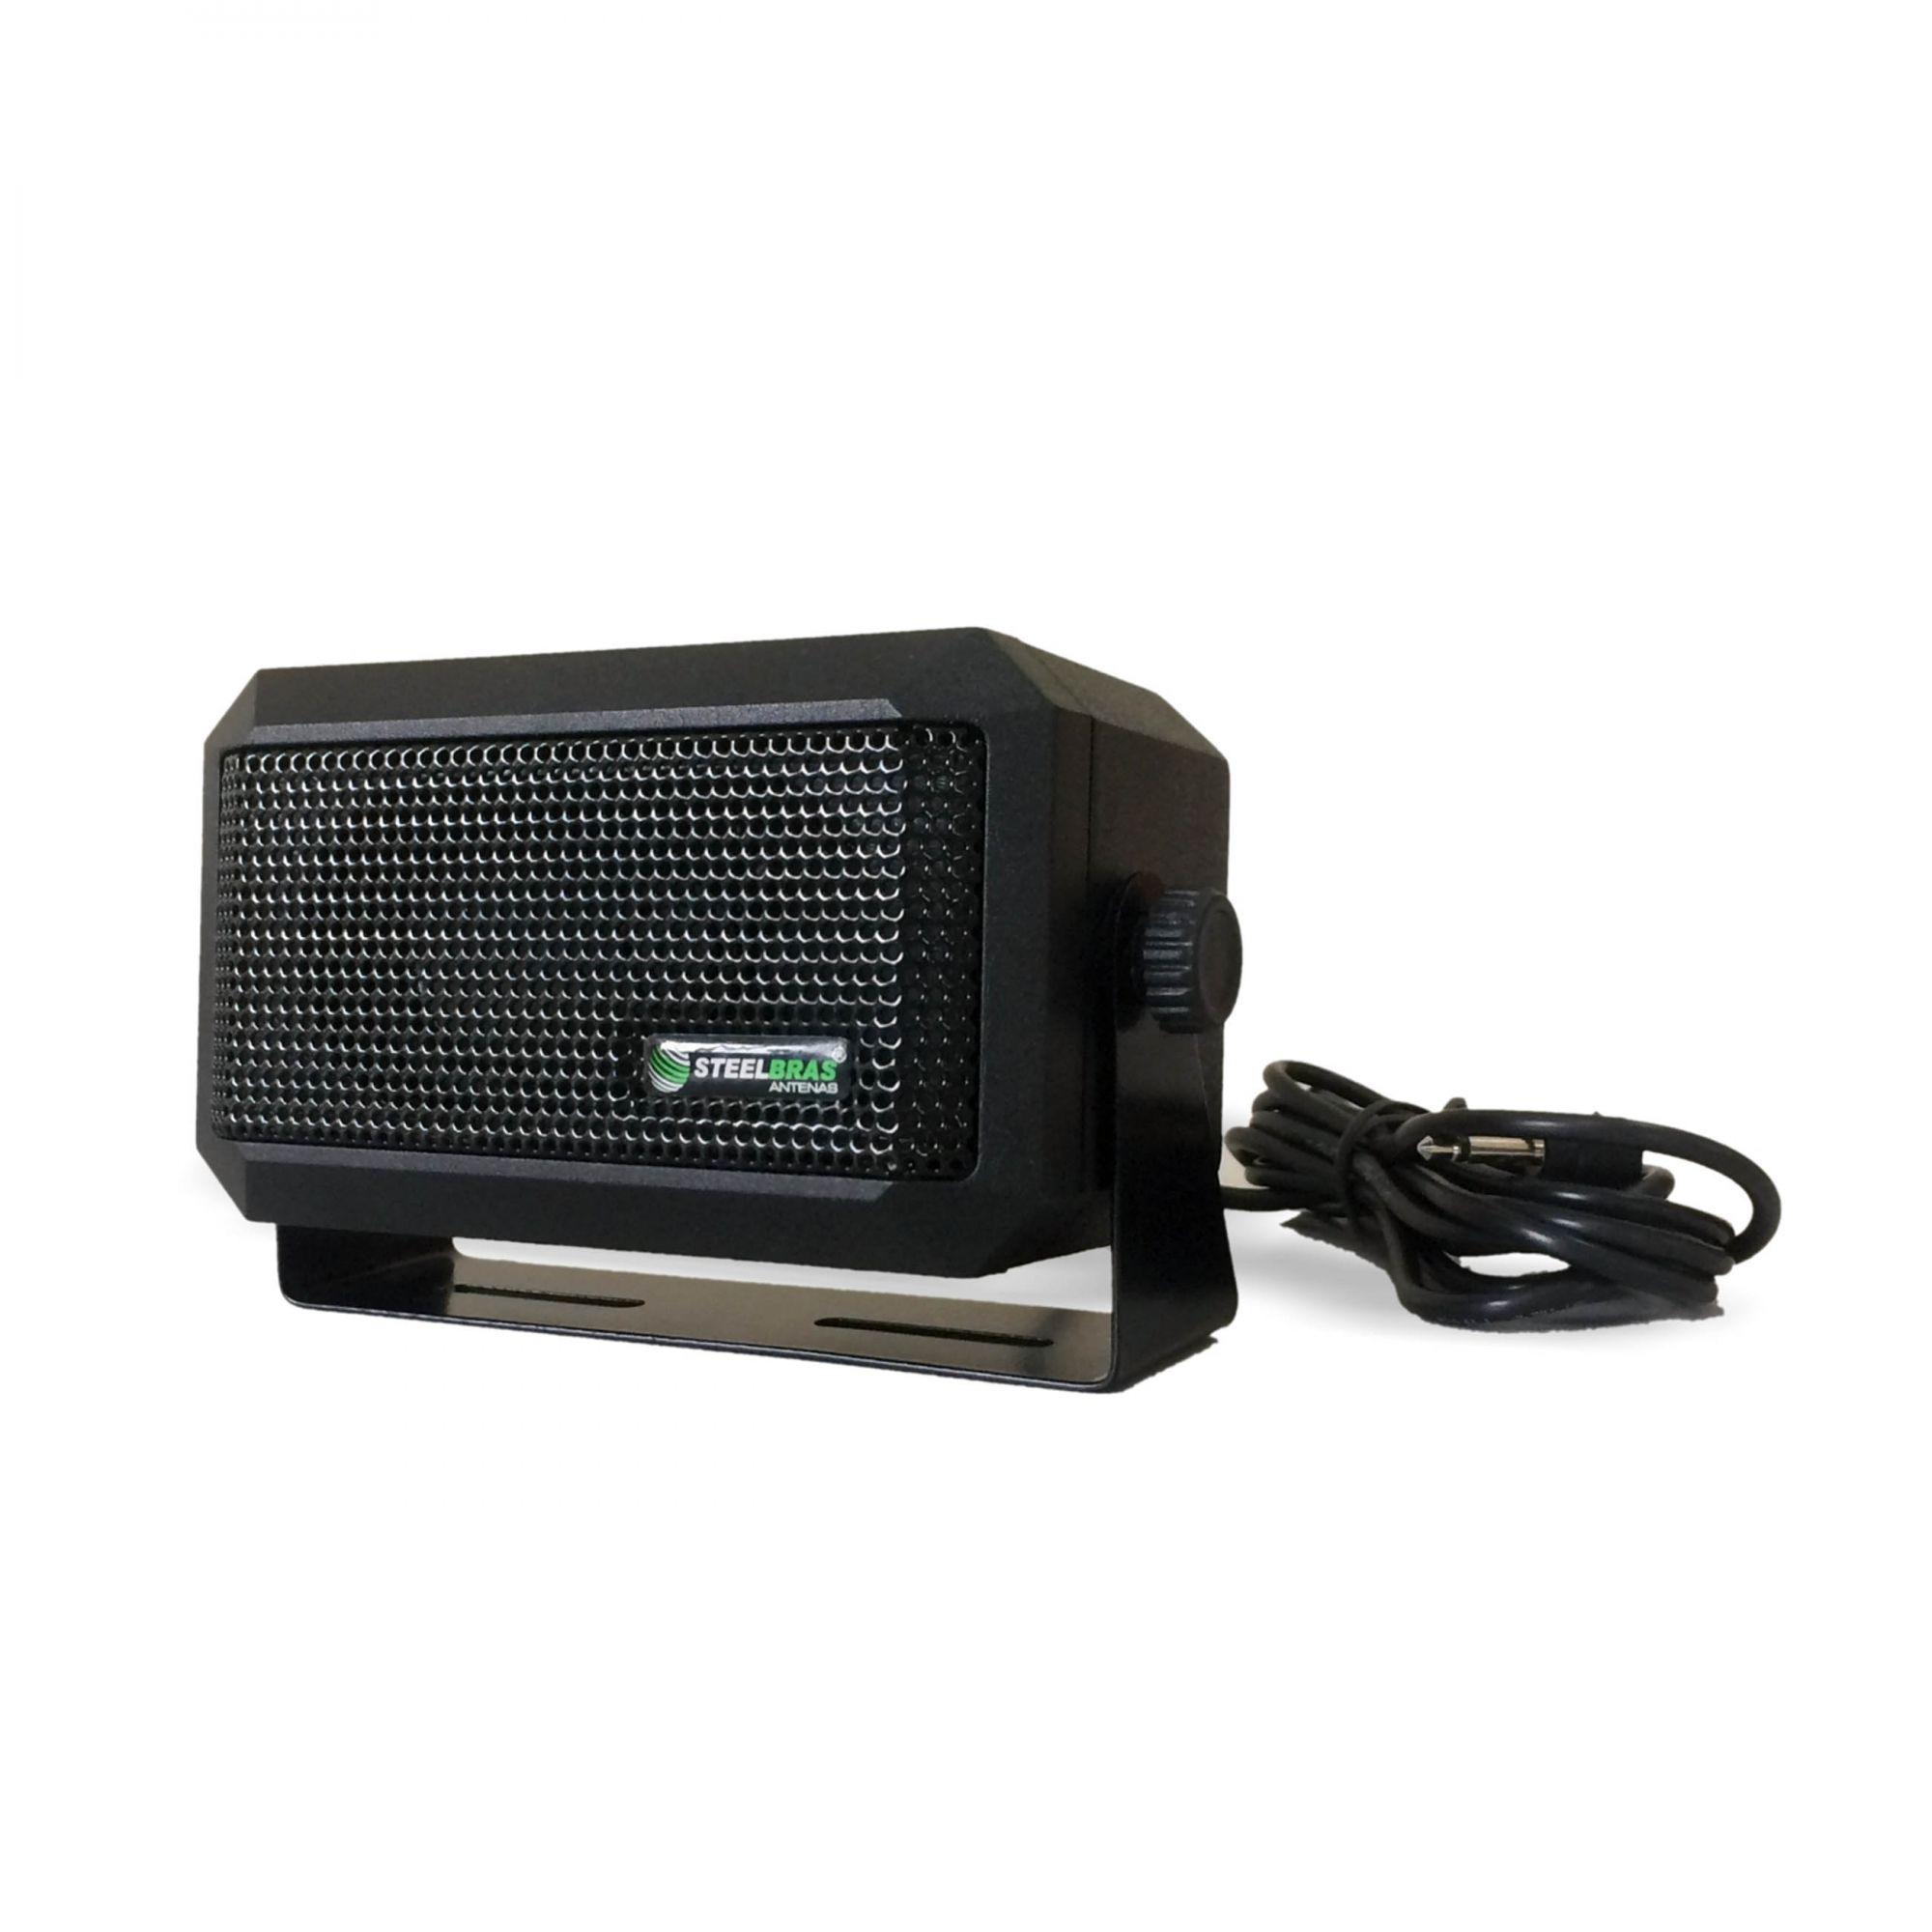 Caixa Acustica para Radiocomunicacao Steelbras - AP4885